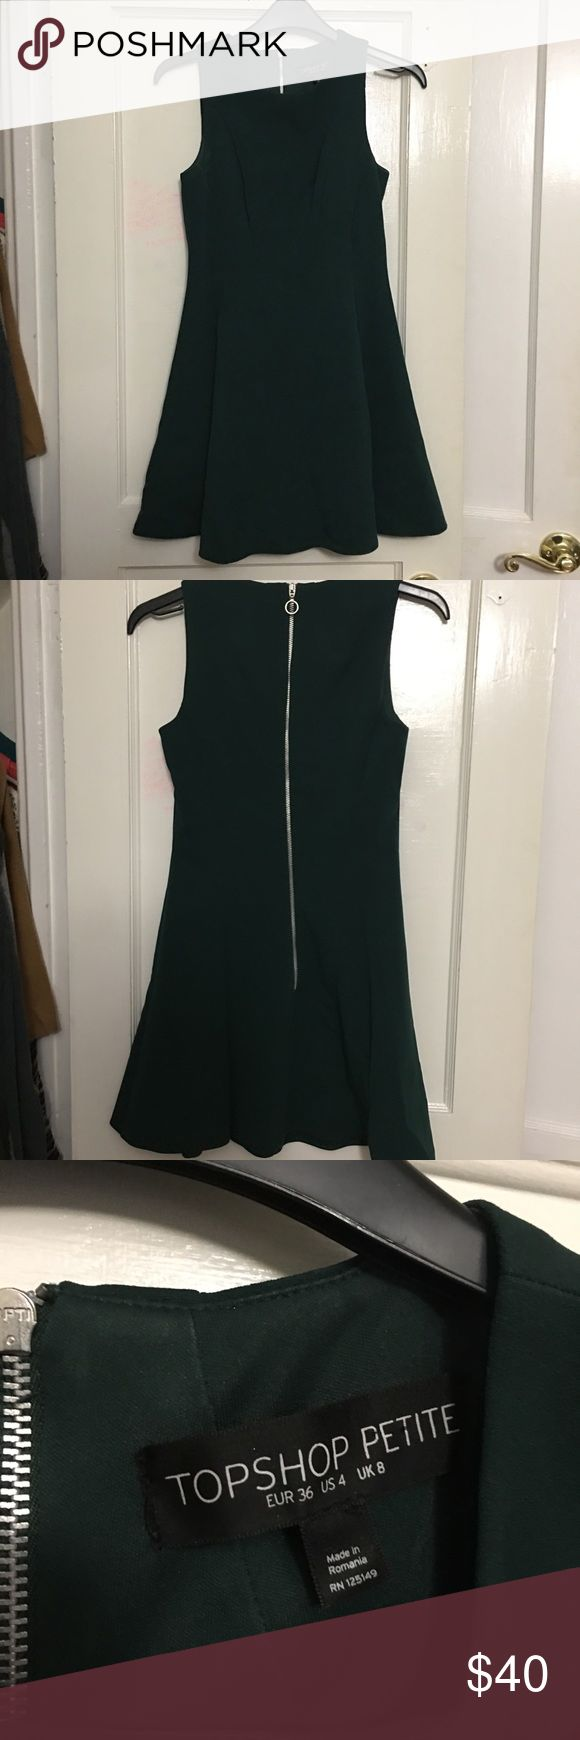 Topshop dress Dark green petite dress from ASOS. Worn once! Topshop PETITE Dresses